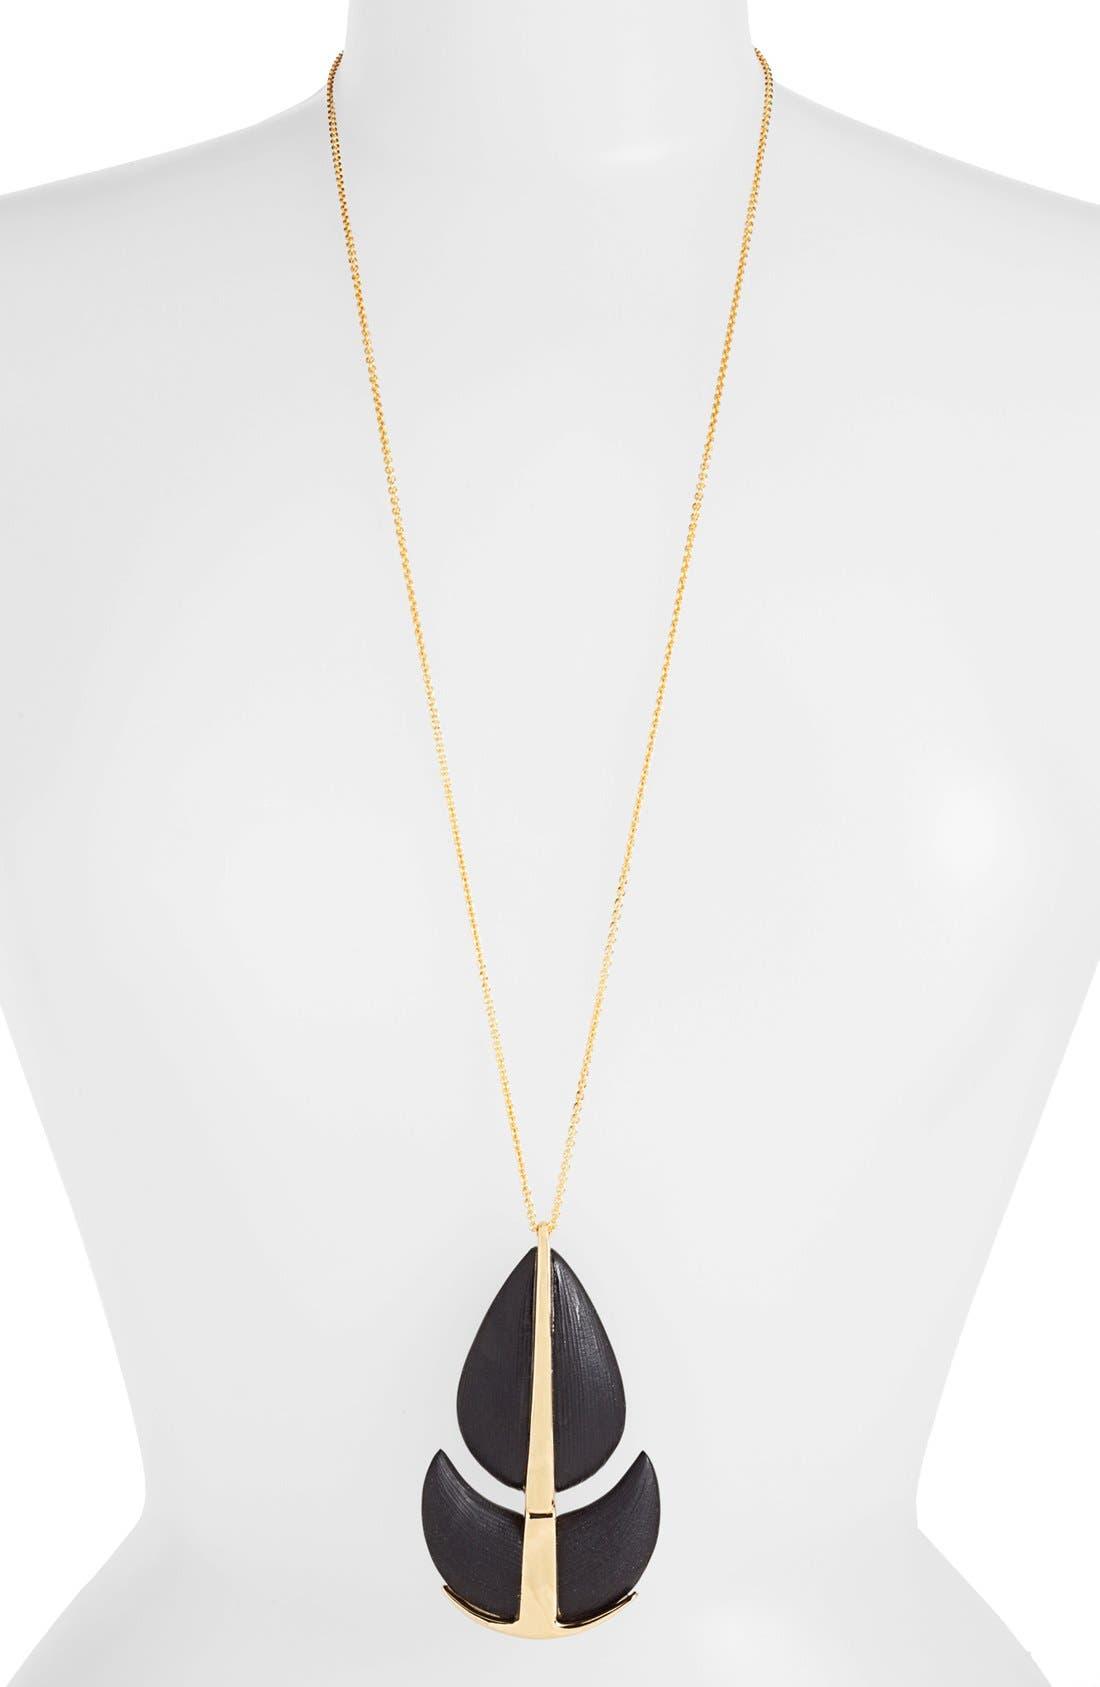 Alternate Image 1 Selected - Alexis Bittar 'Lucite® - Neo Bohemian' Long Pendant Necklace